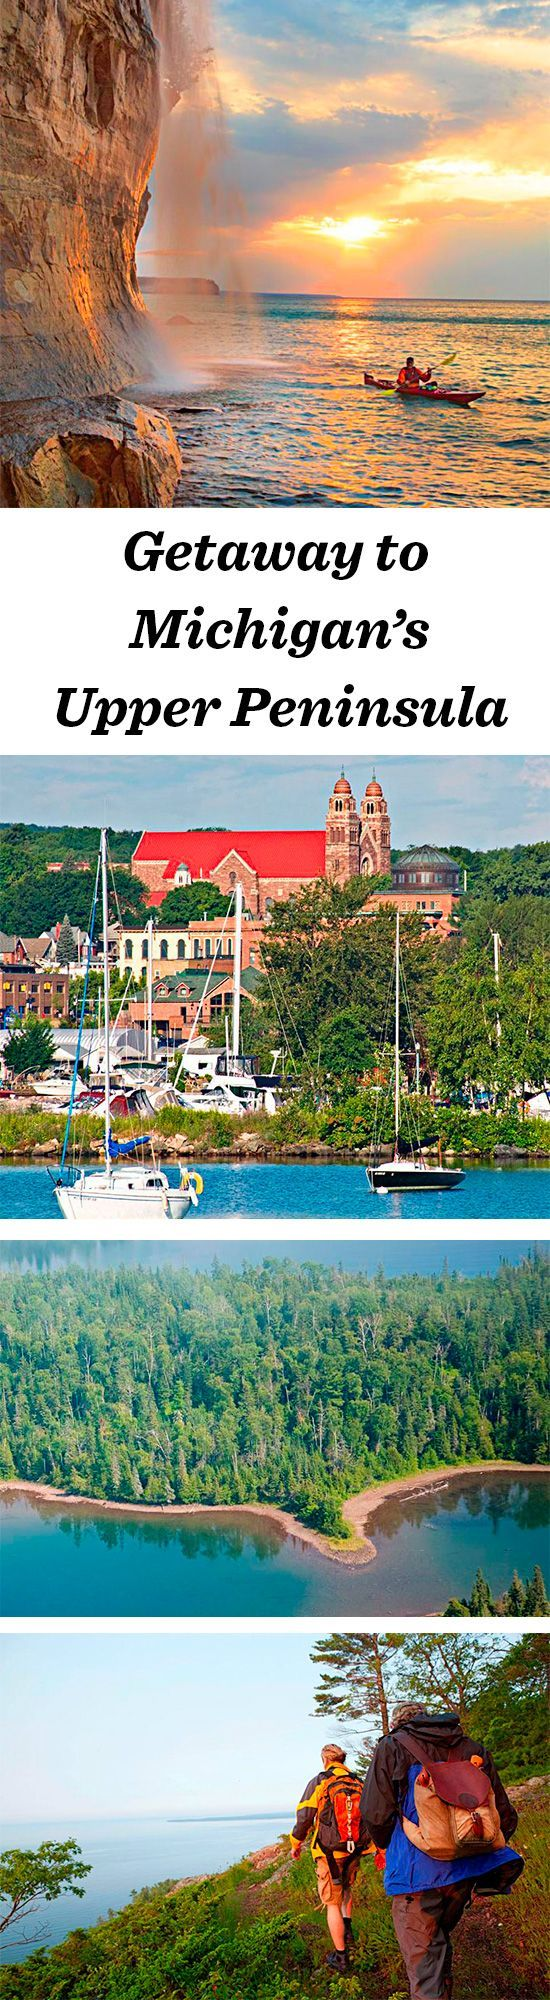 Upper Peninsula Travel Forum - TripAdvisor